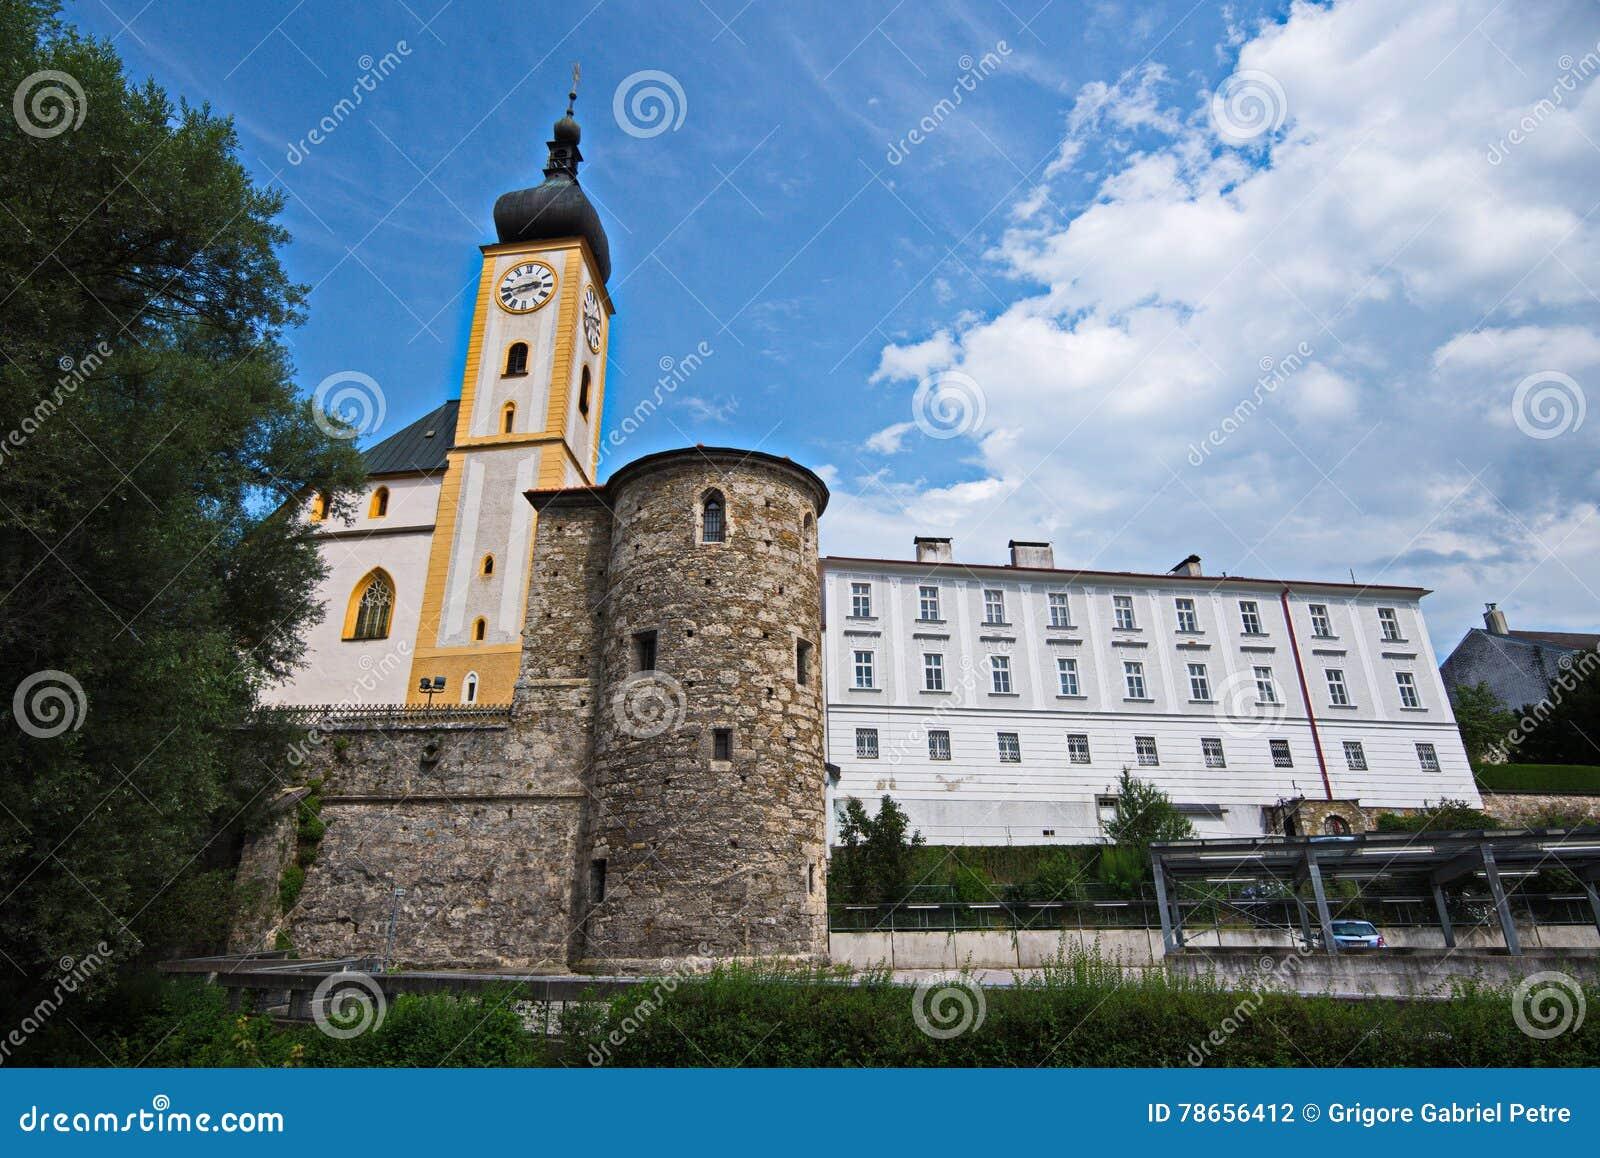 Schloss Rothschild - Castle στην Αυστρία